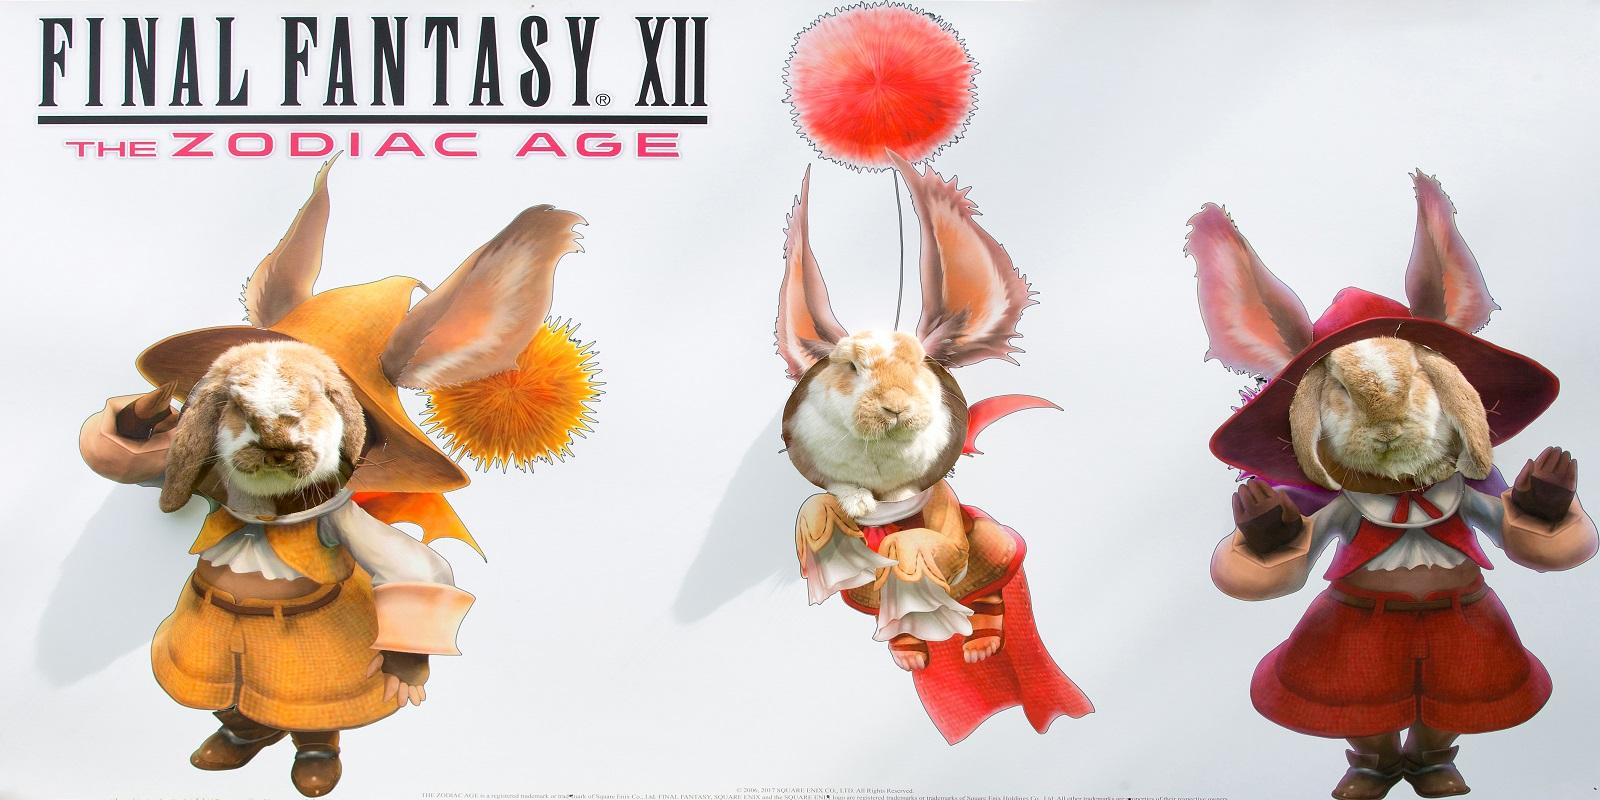 Final Fantasy XII The Zodiac Age Moogle Watch Livestream - 5th July 2017.